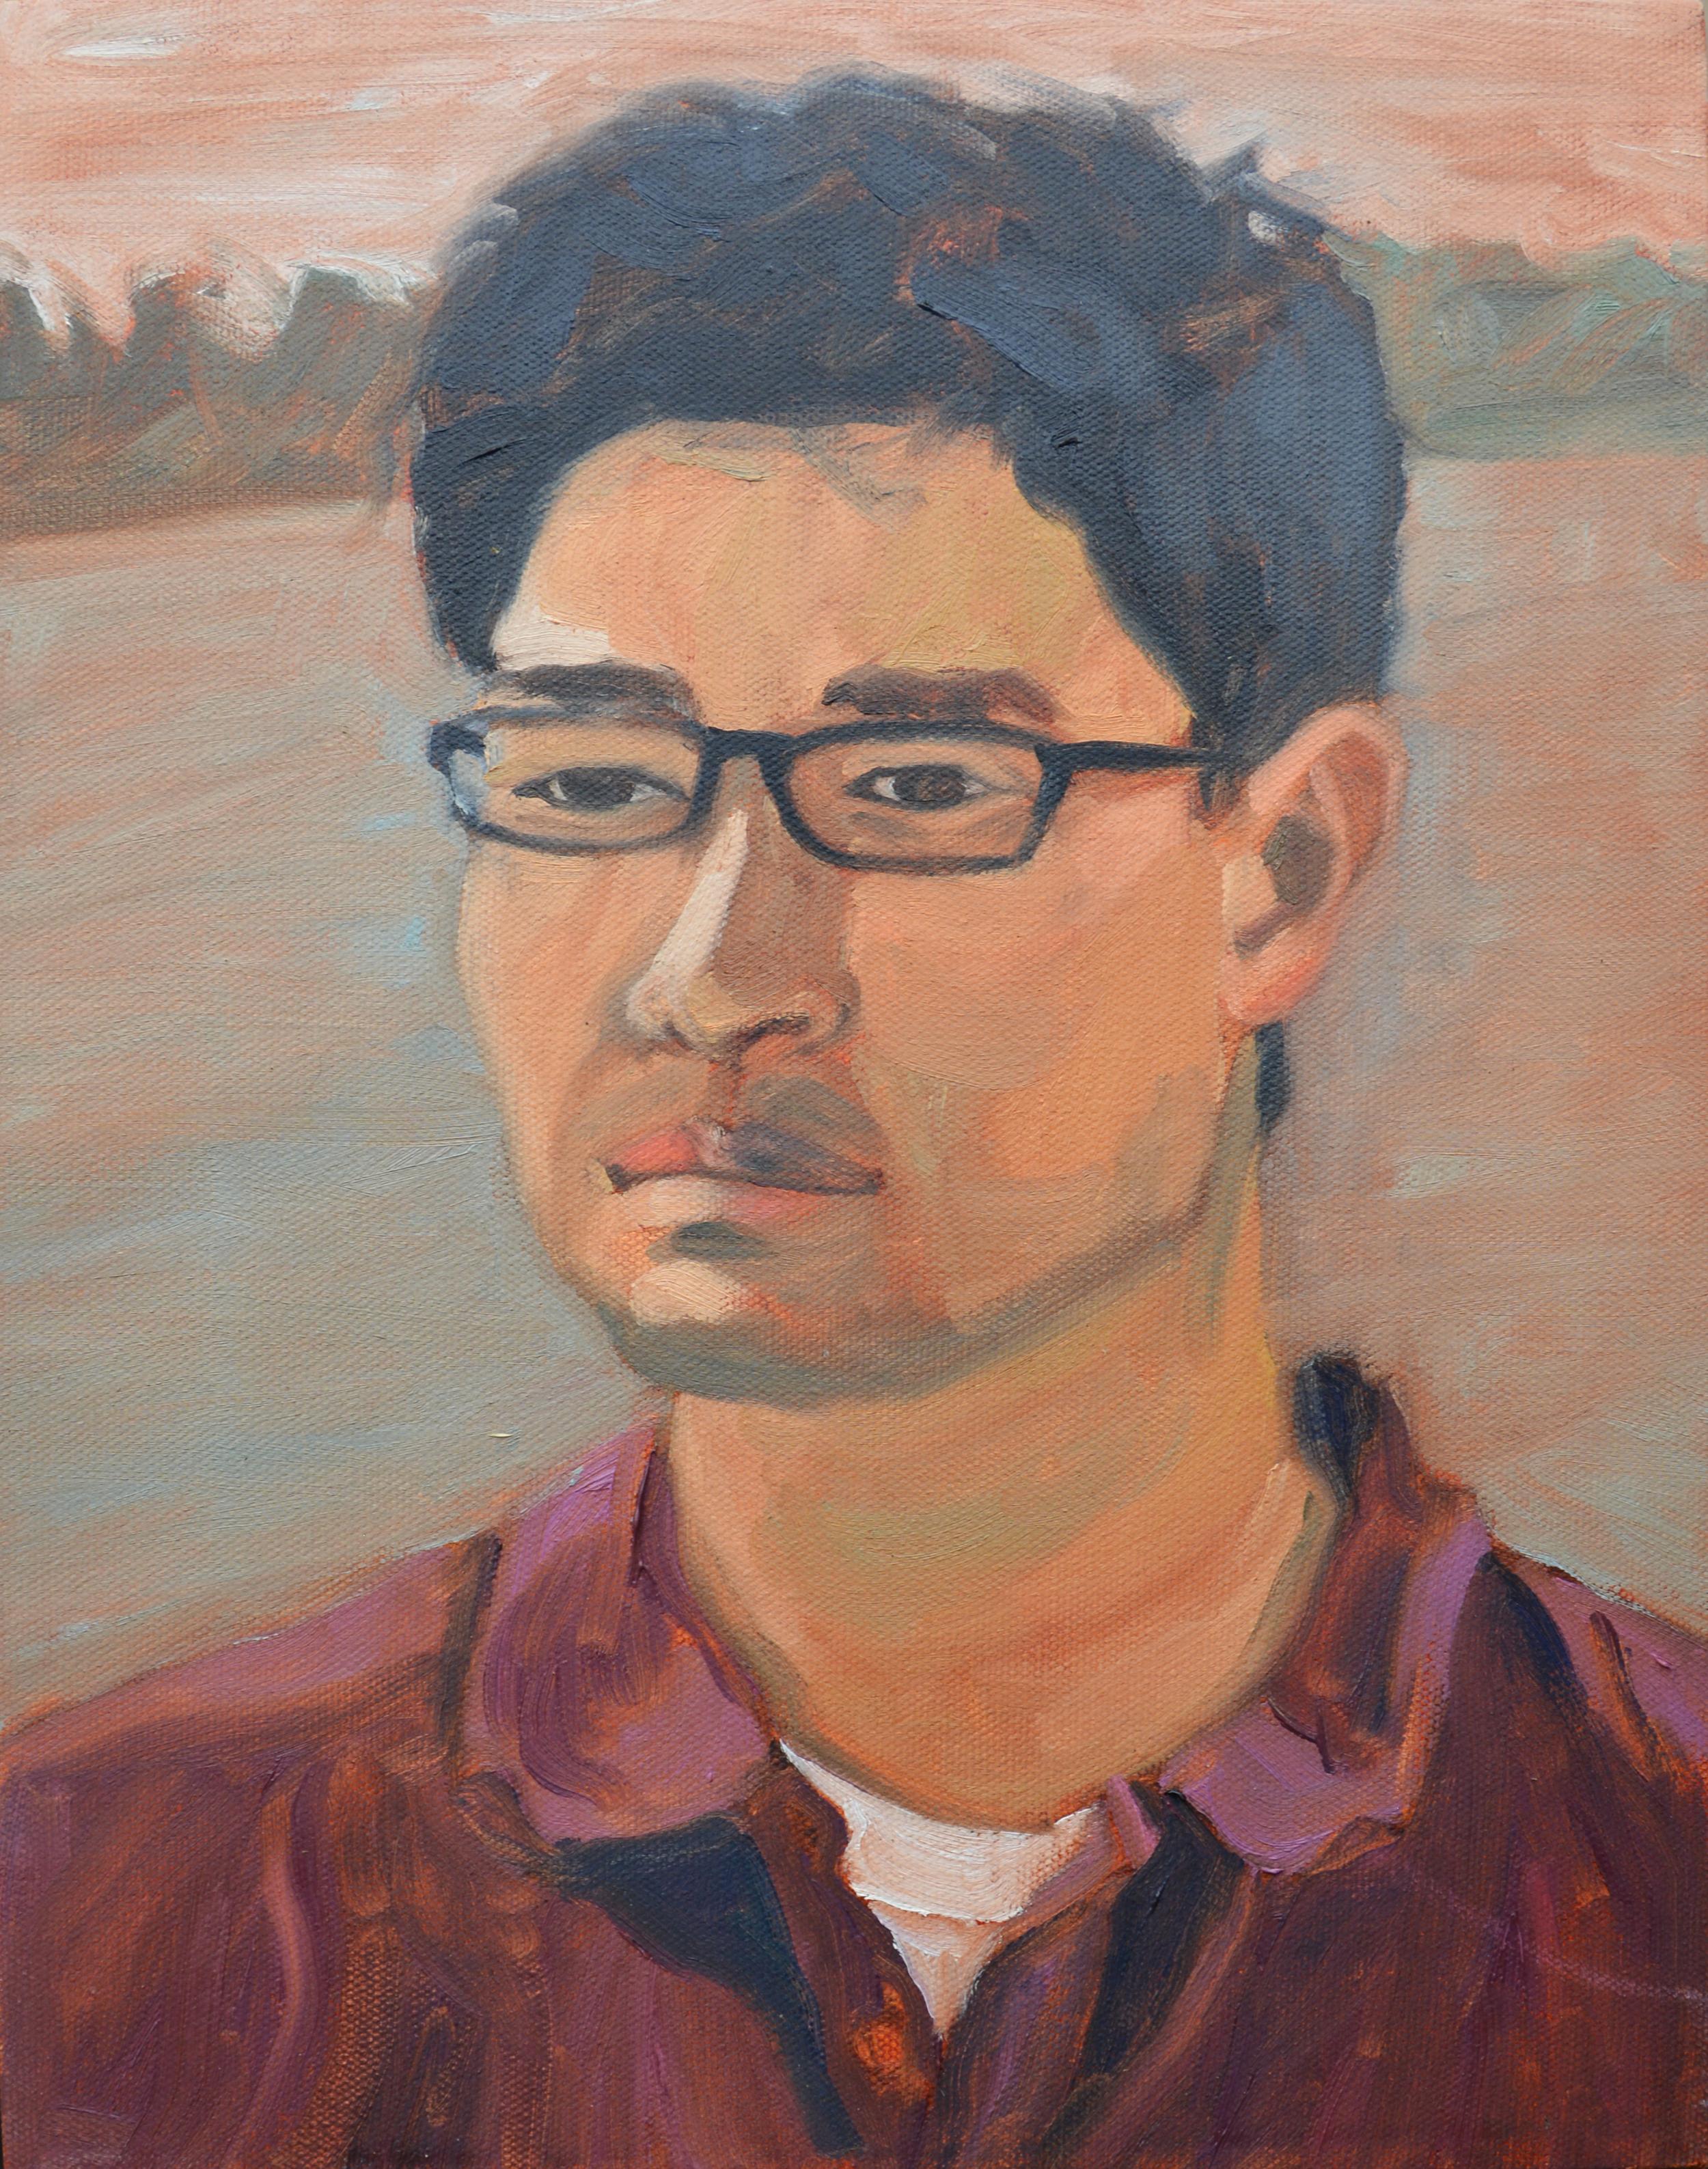 "John, 11x14"", oil on canvas, 2011"